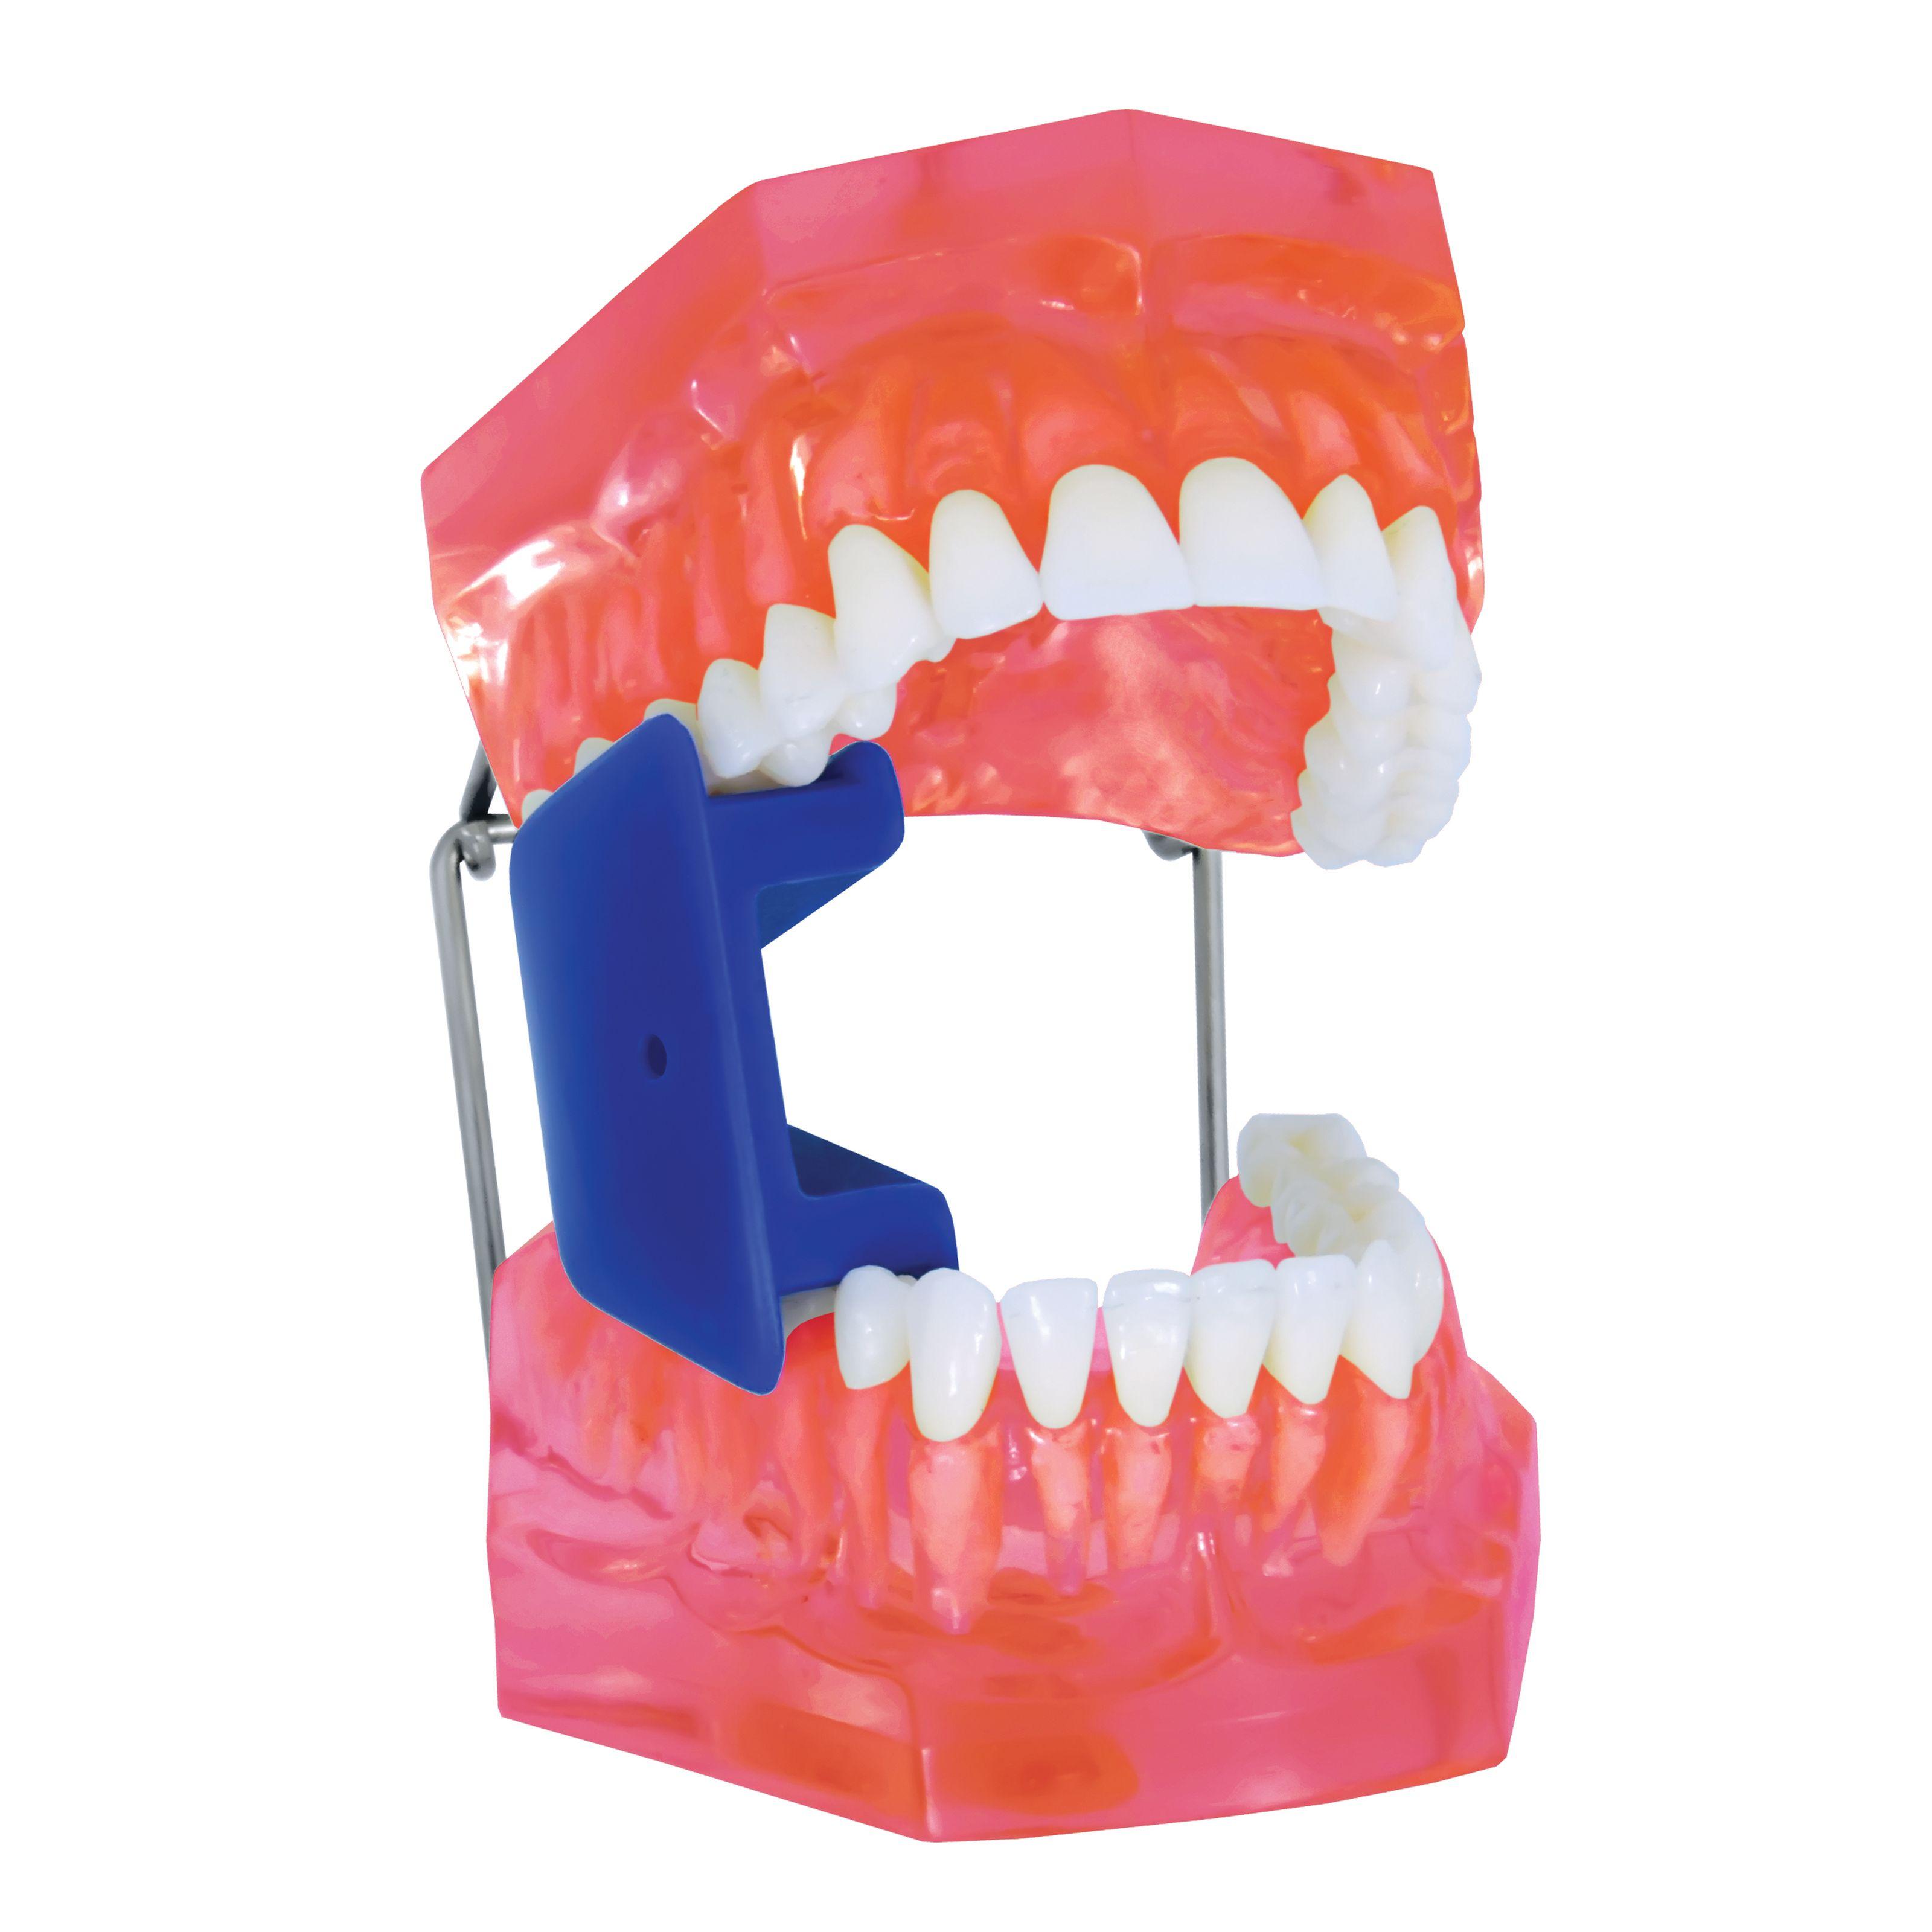 Mouth prop, MARKEL, child, medium size